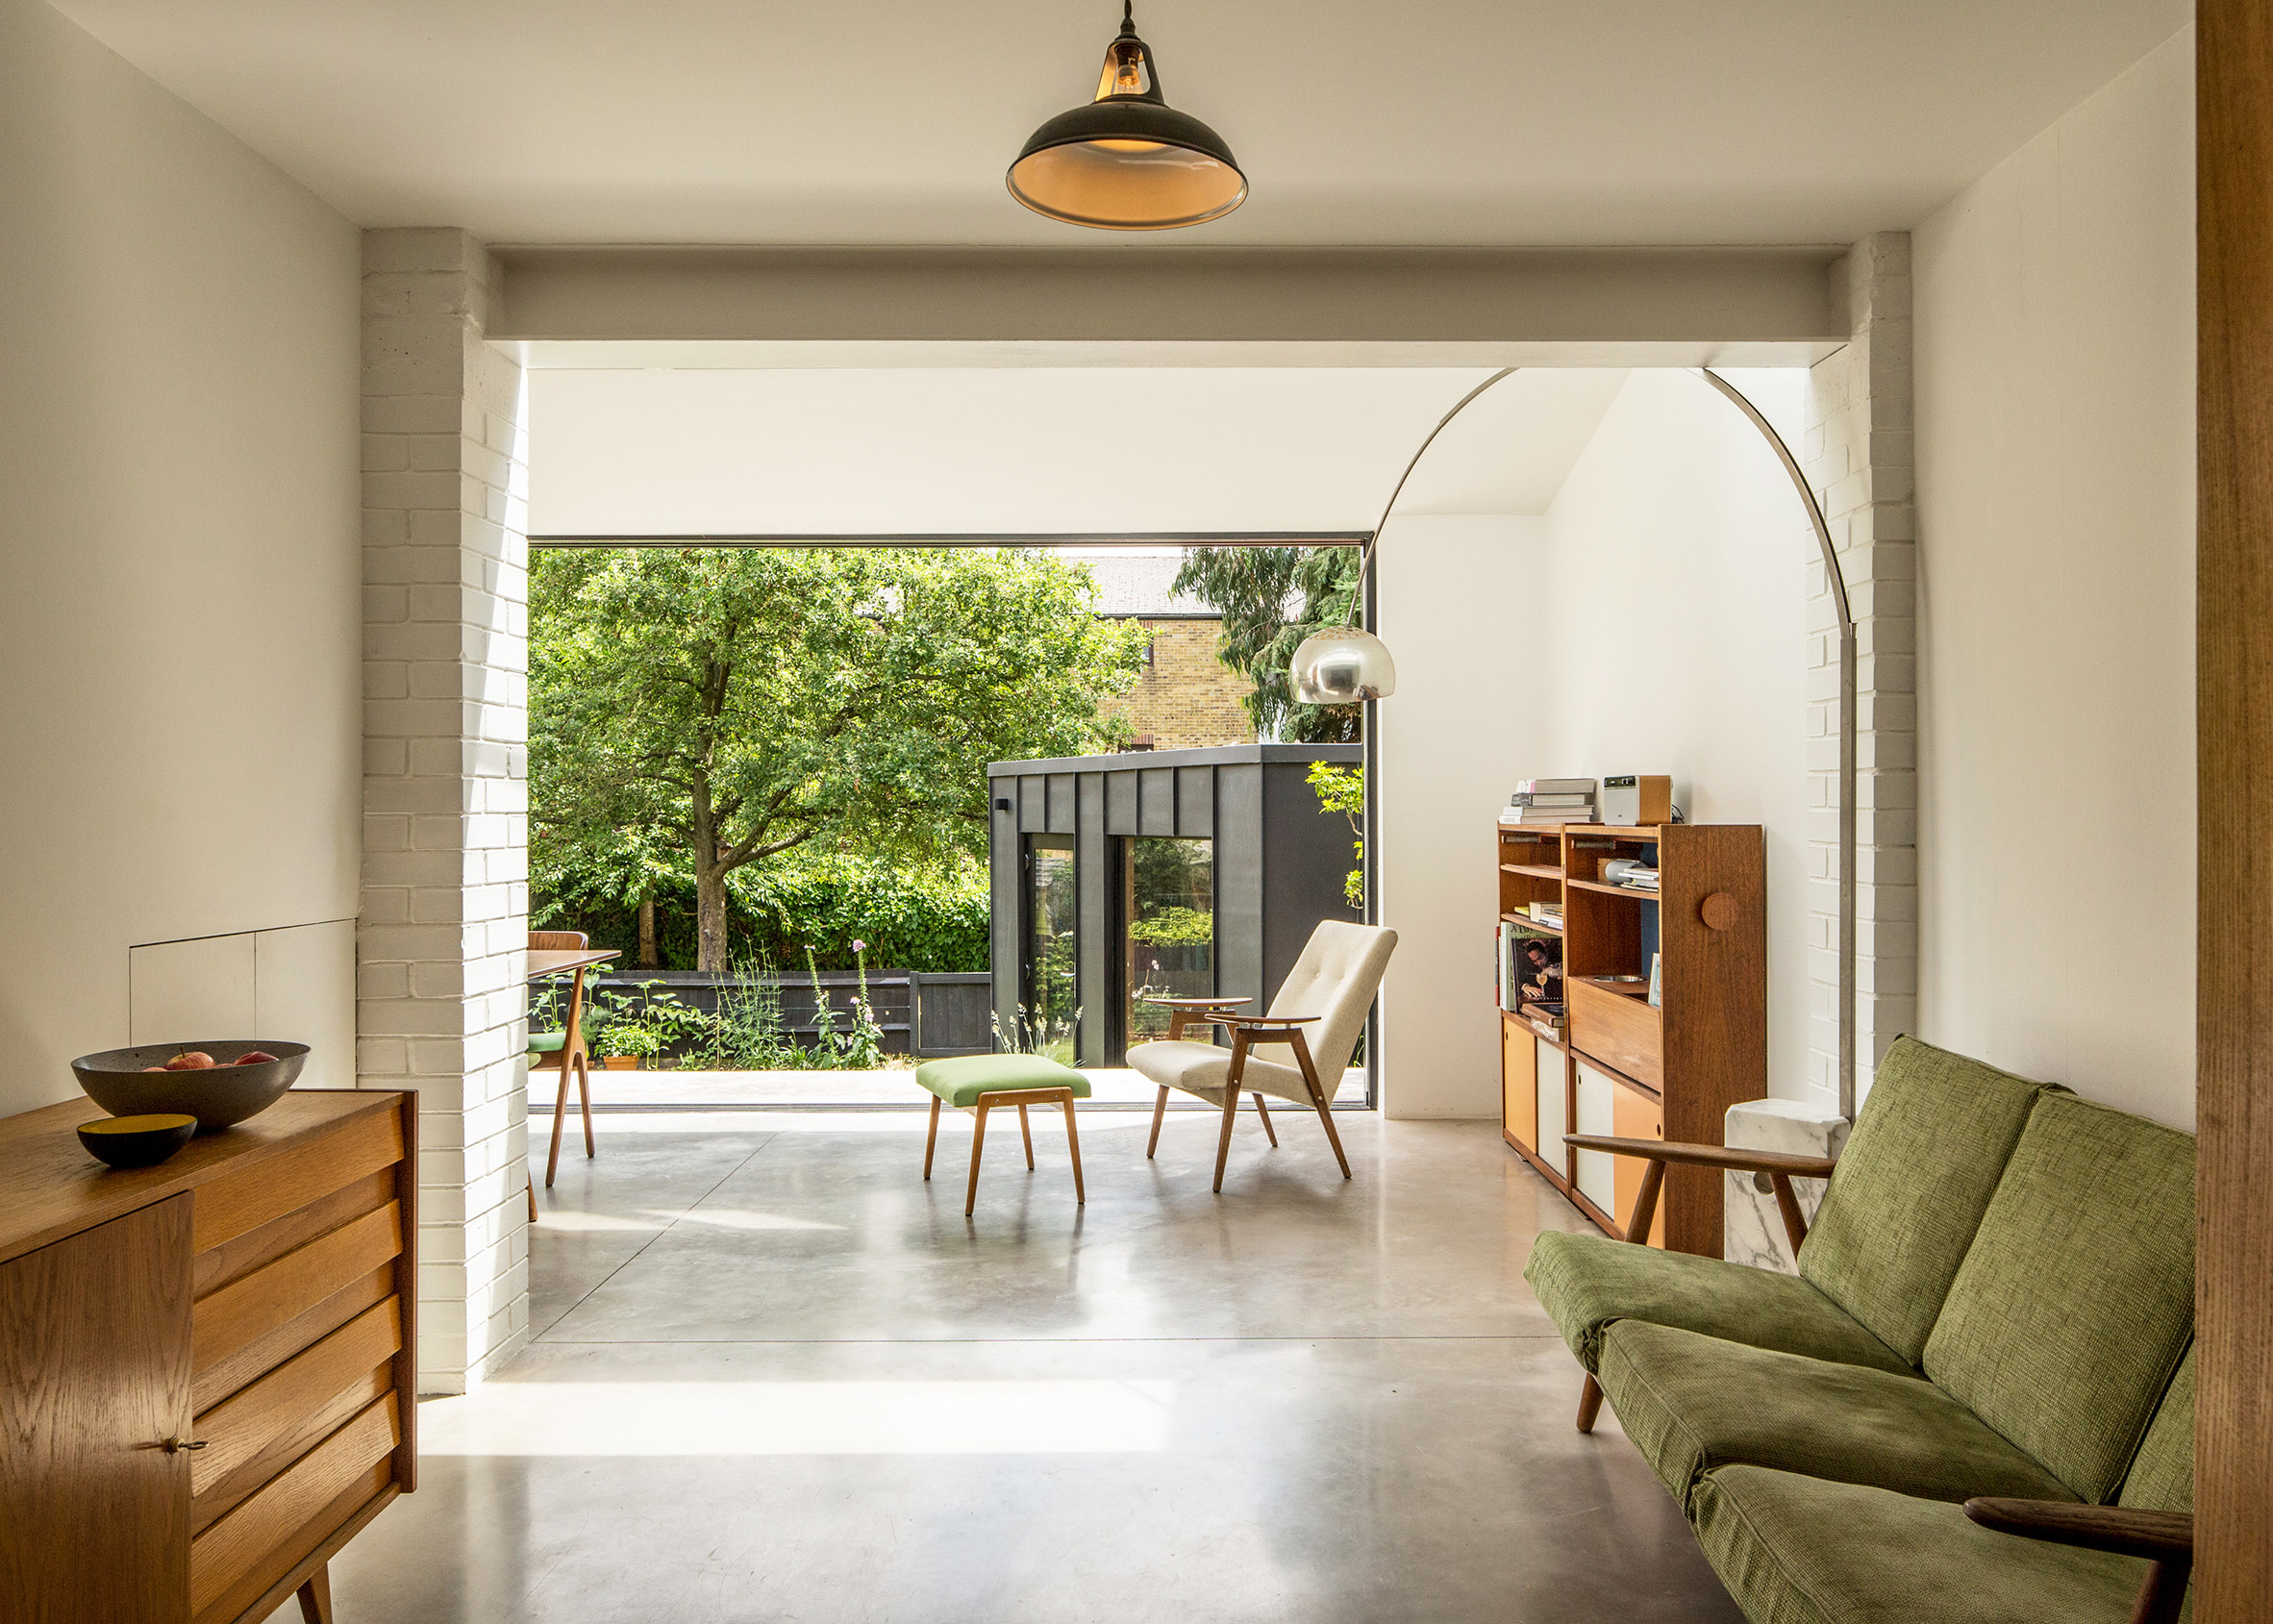 3 Elm Close, Islington, by Ulla Gala Architects